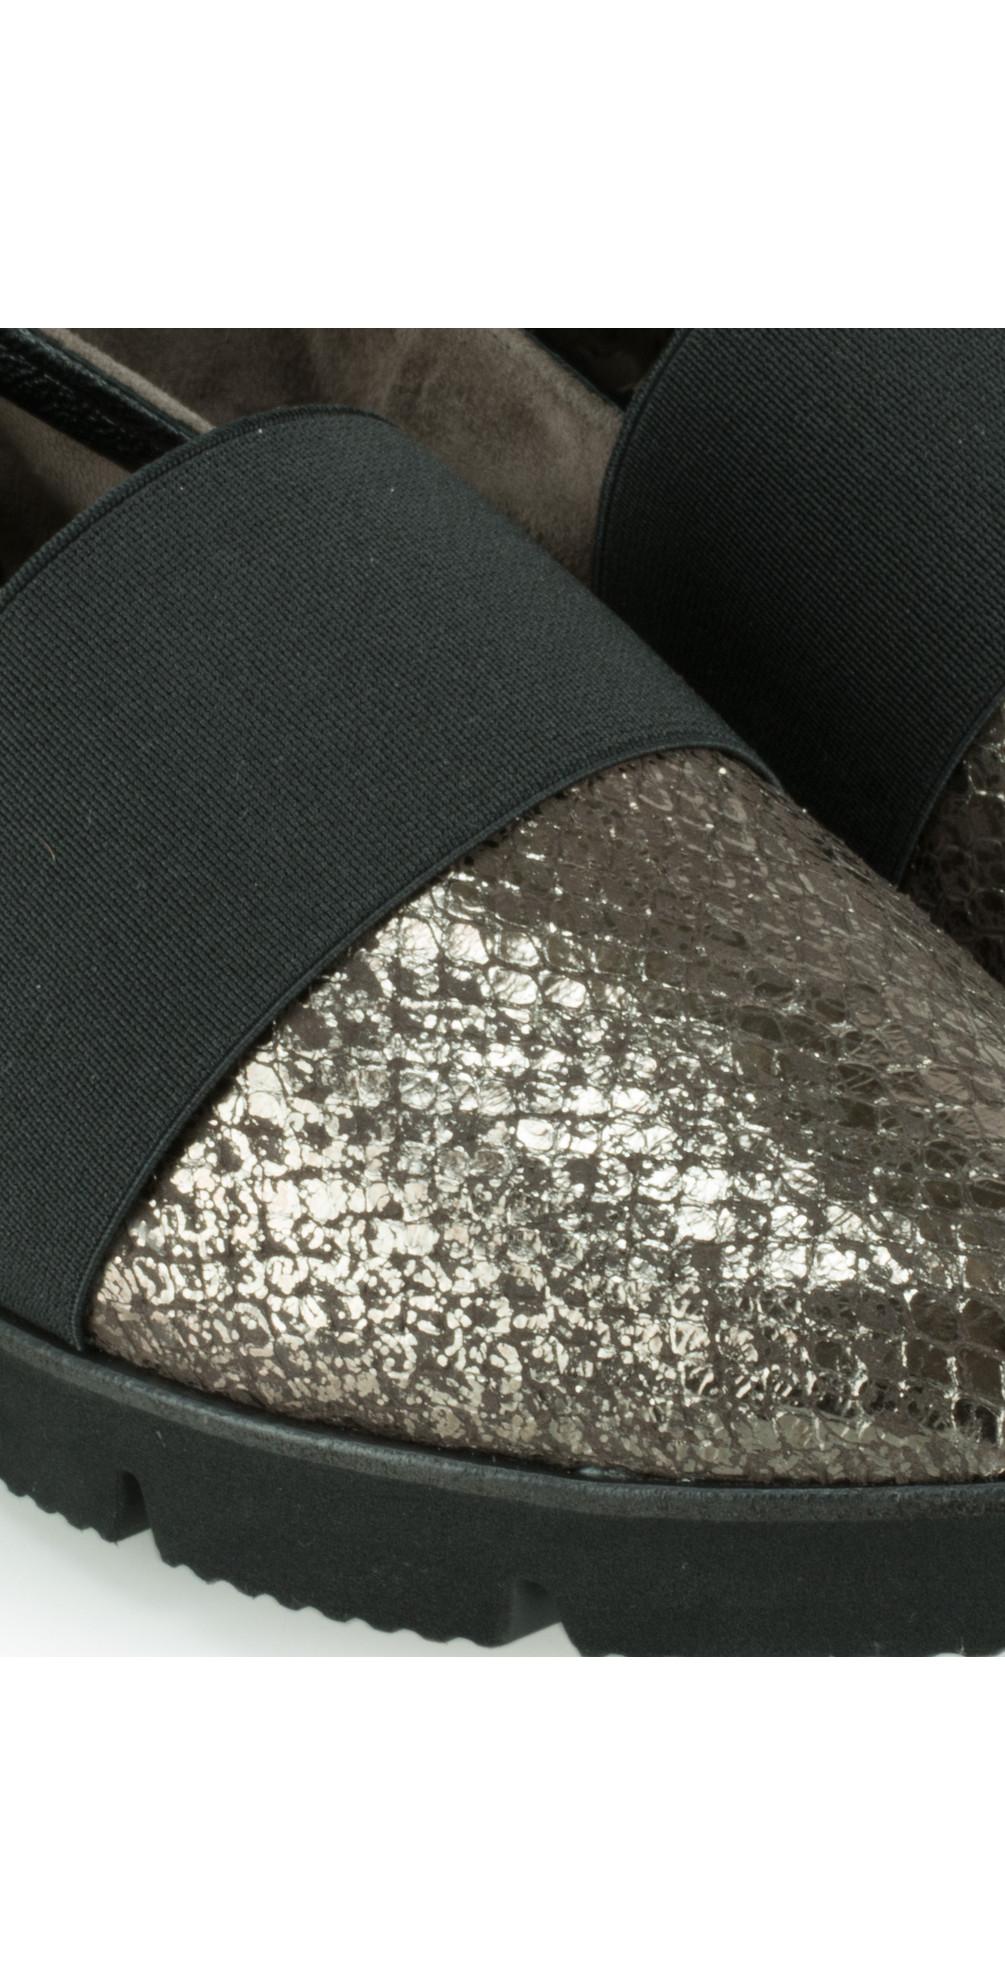 kennel und schmenger pia x goju shoe in moro smoke. Black Bedroom Furniture Sets. Home Design Ideas